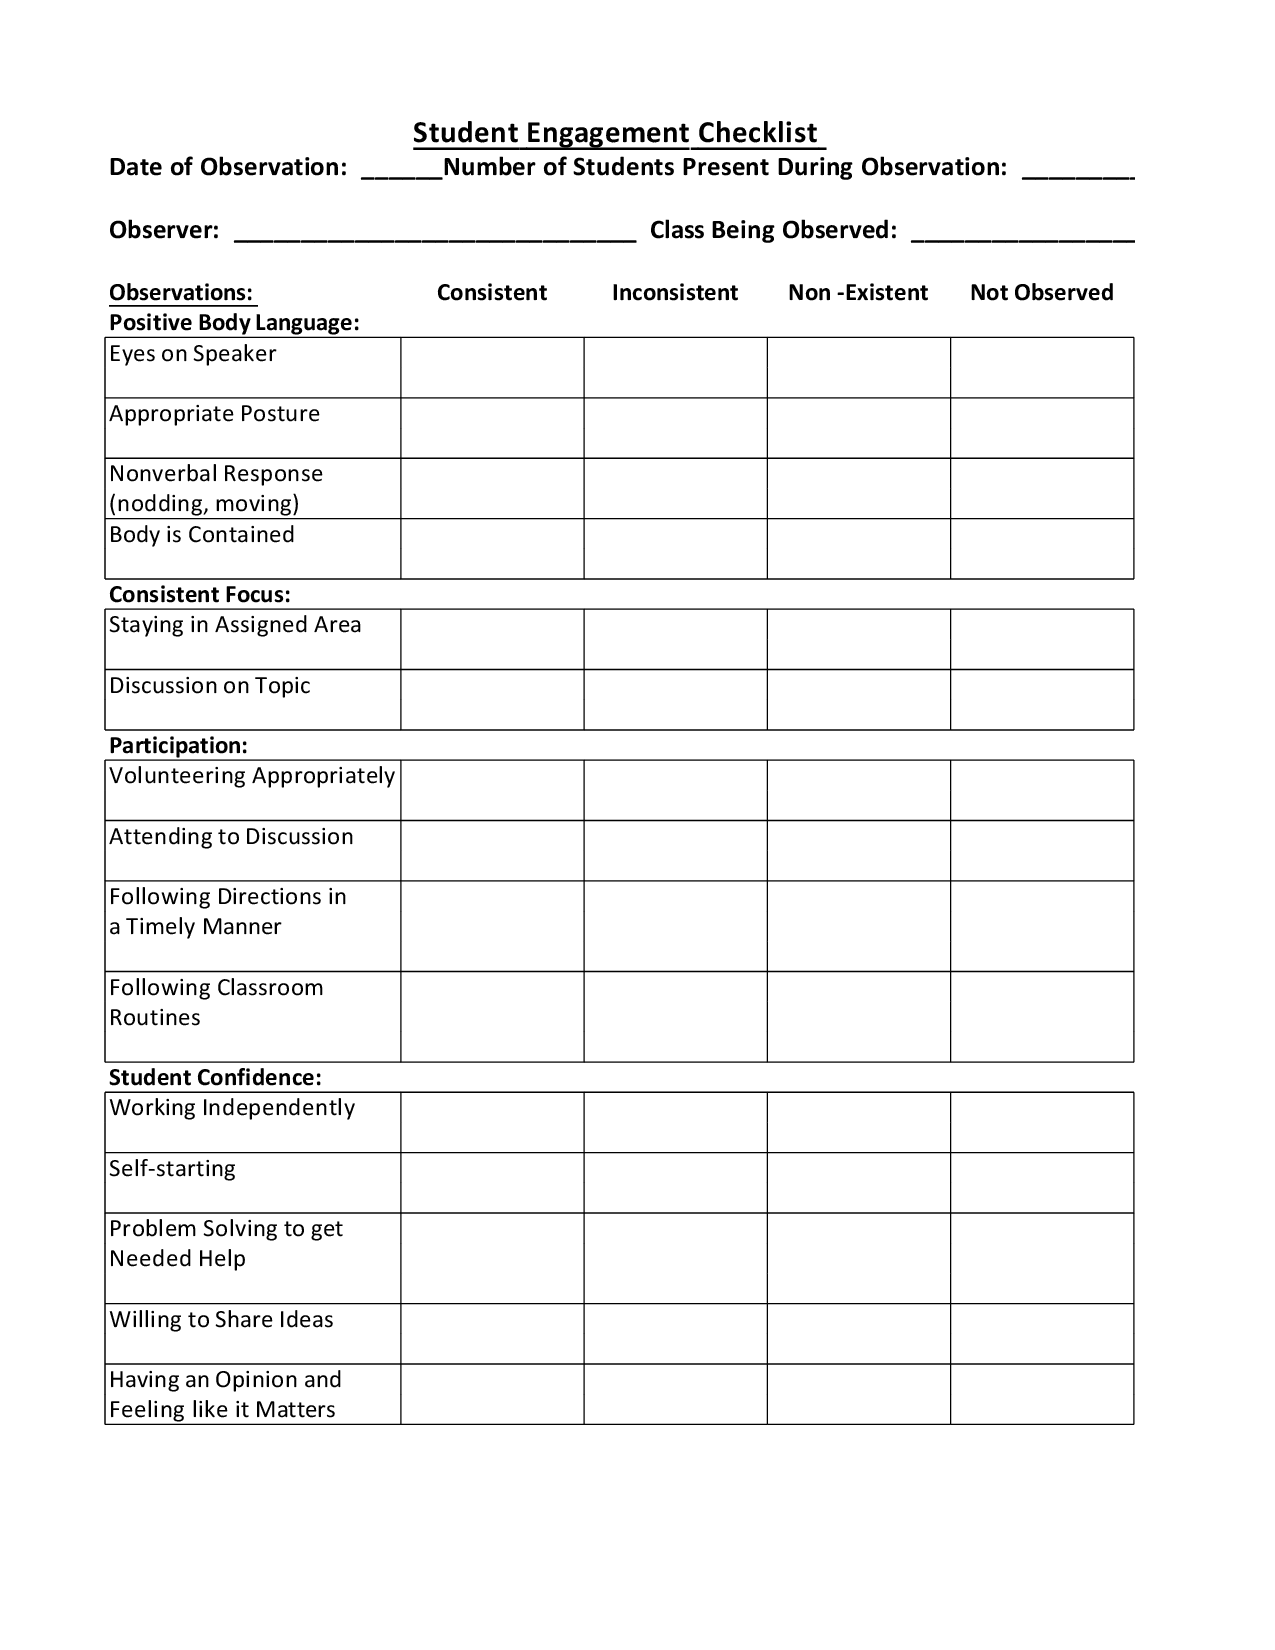 Student Engagement Observation Checklist